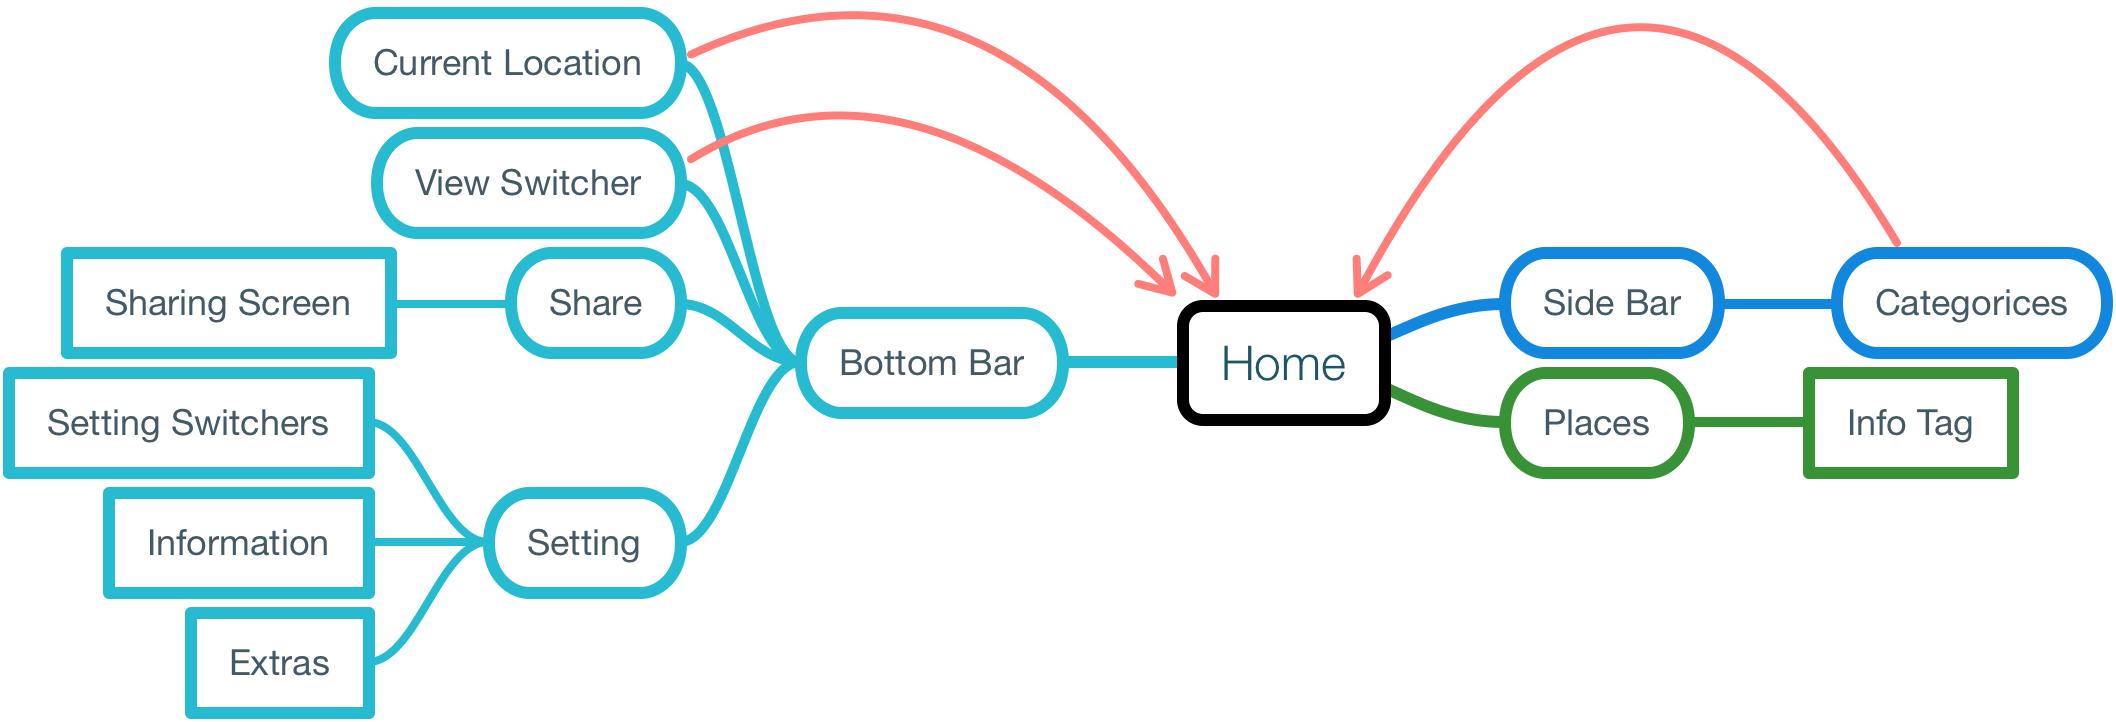 Nolli's information architecture